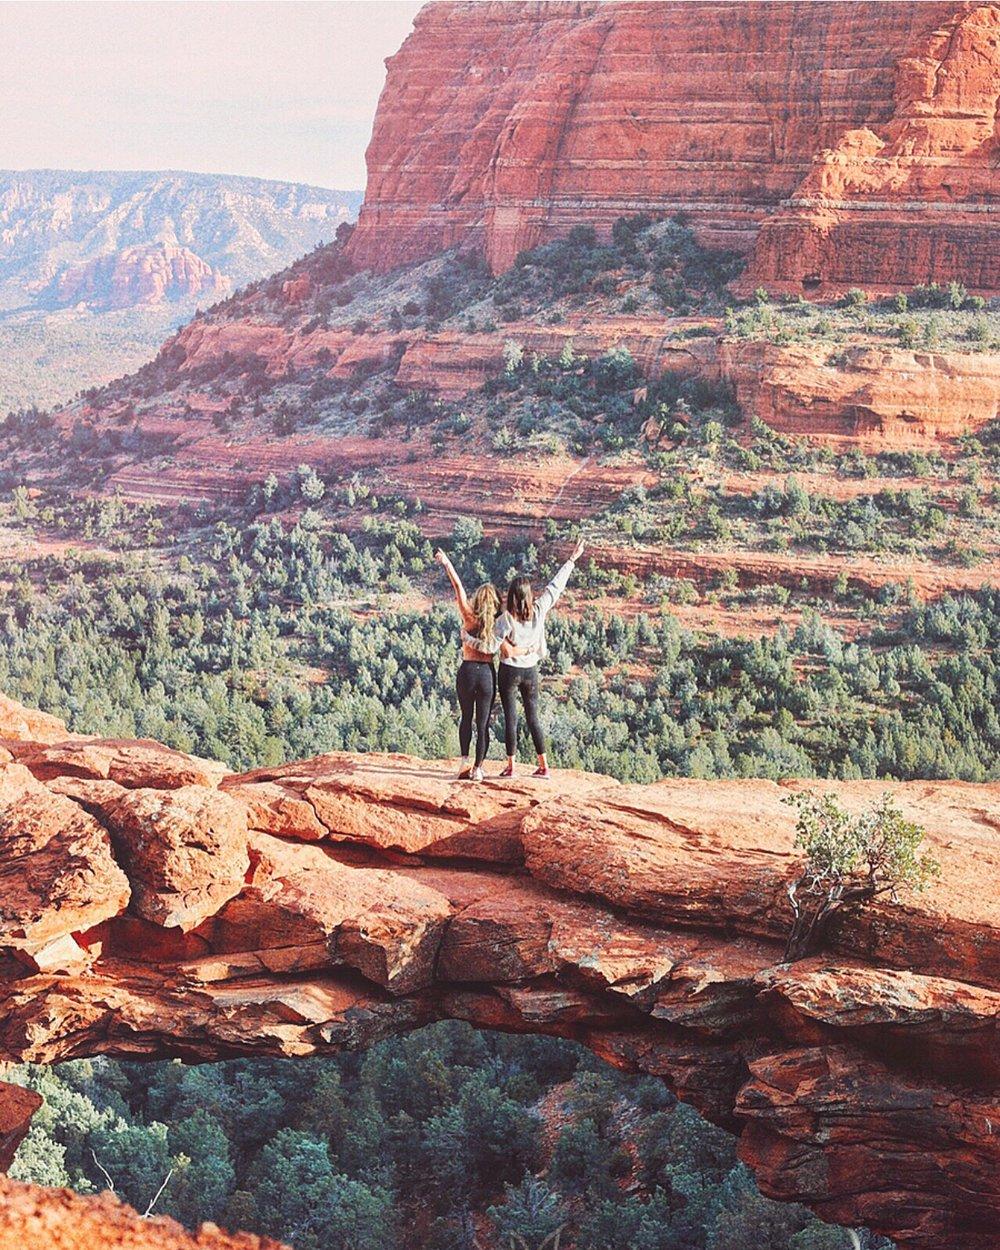 Devil's Bridge Hike Sedona Arizona - Kelly Wirht Photography